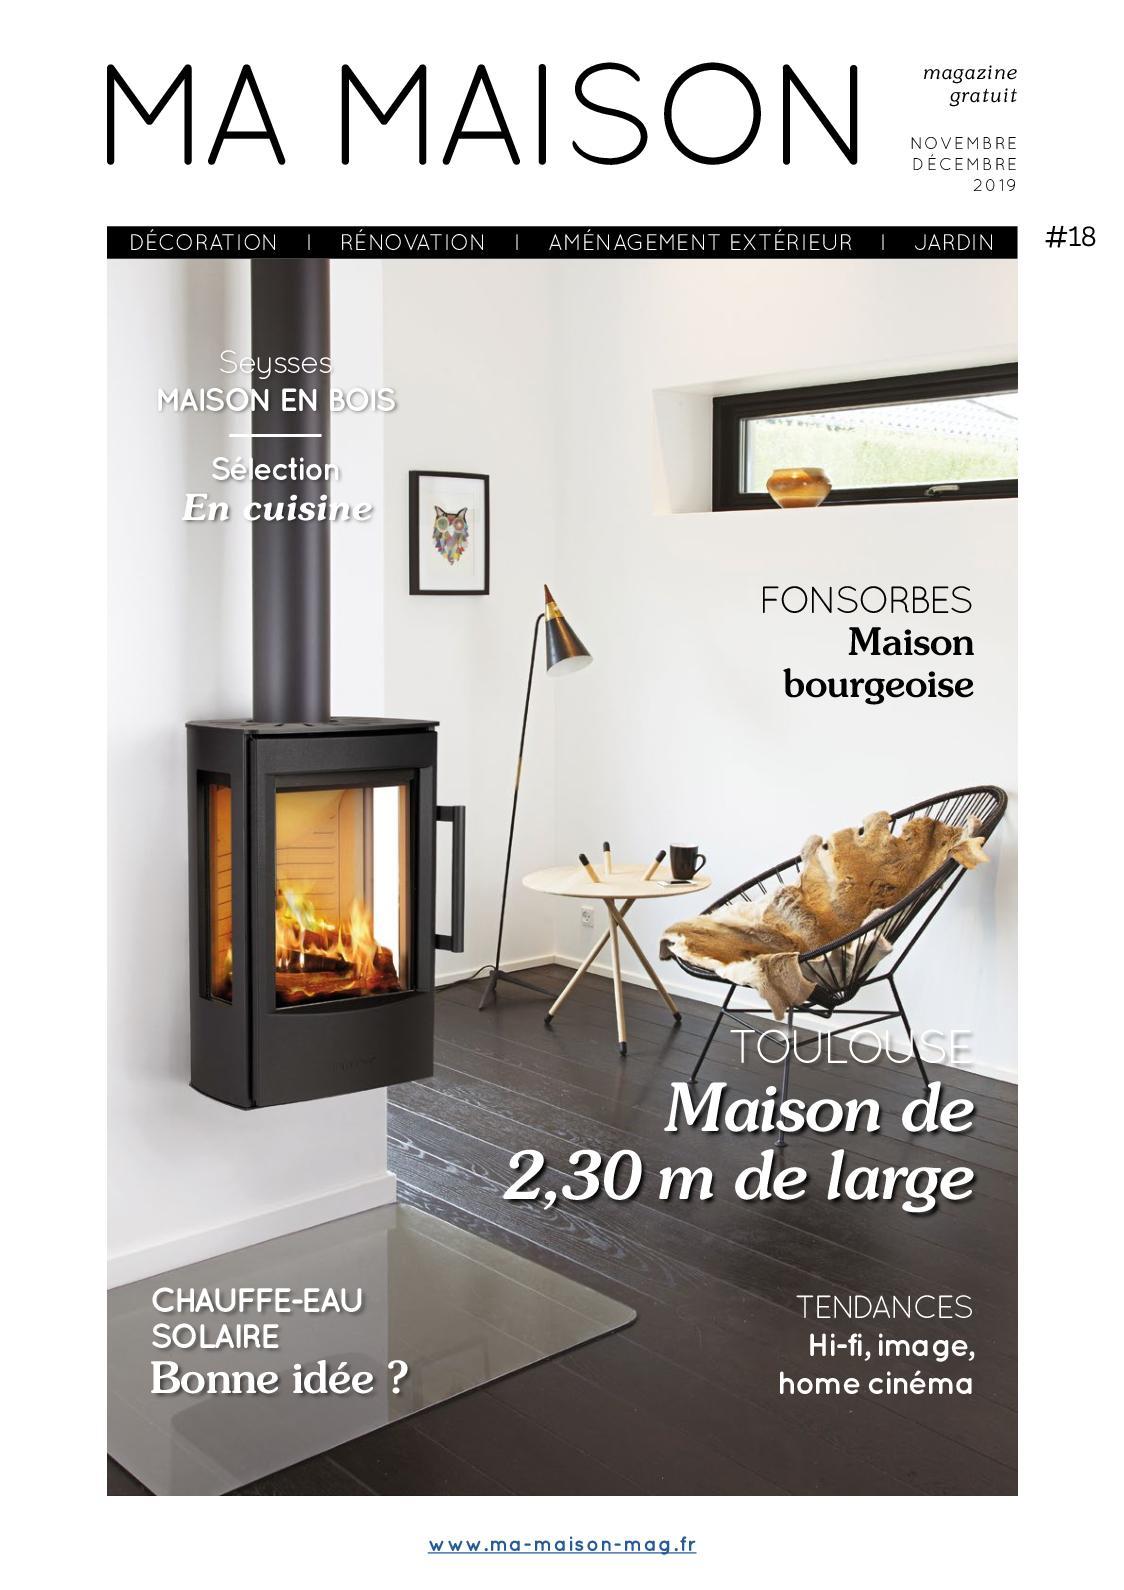 2B Auto Fonsorbes calaméo - ma maison magazine numero 18